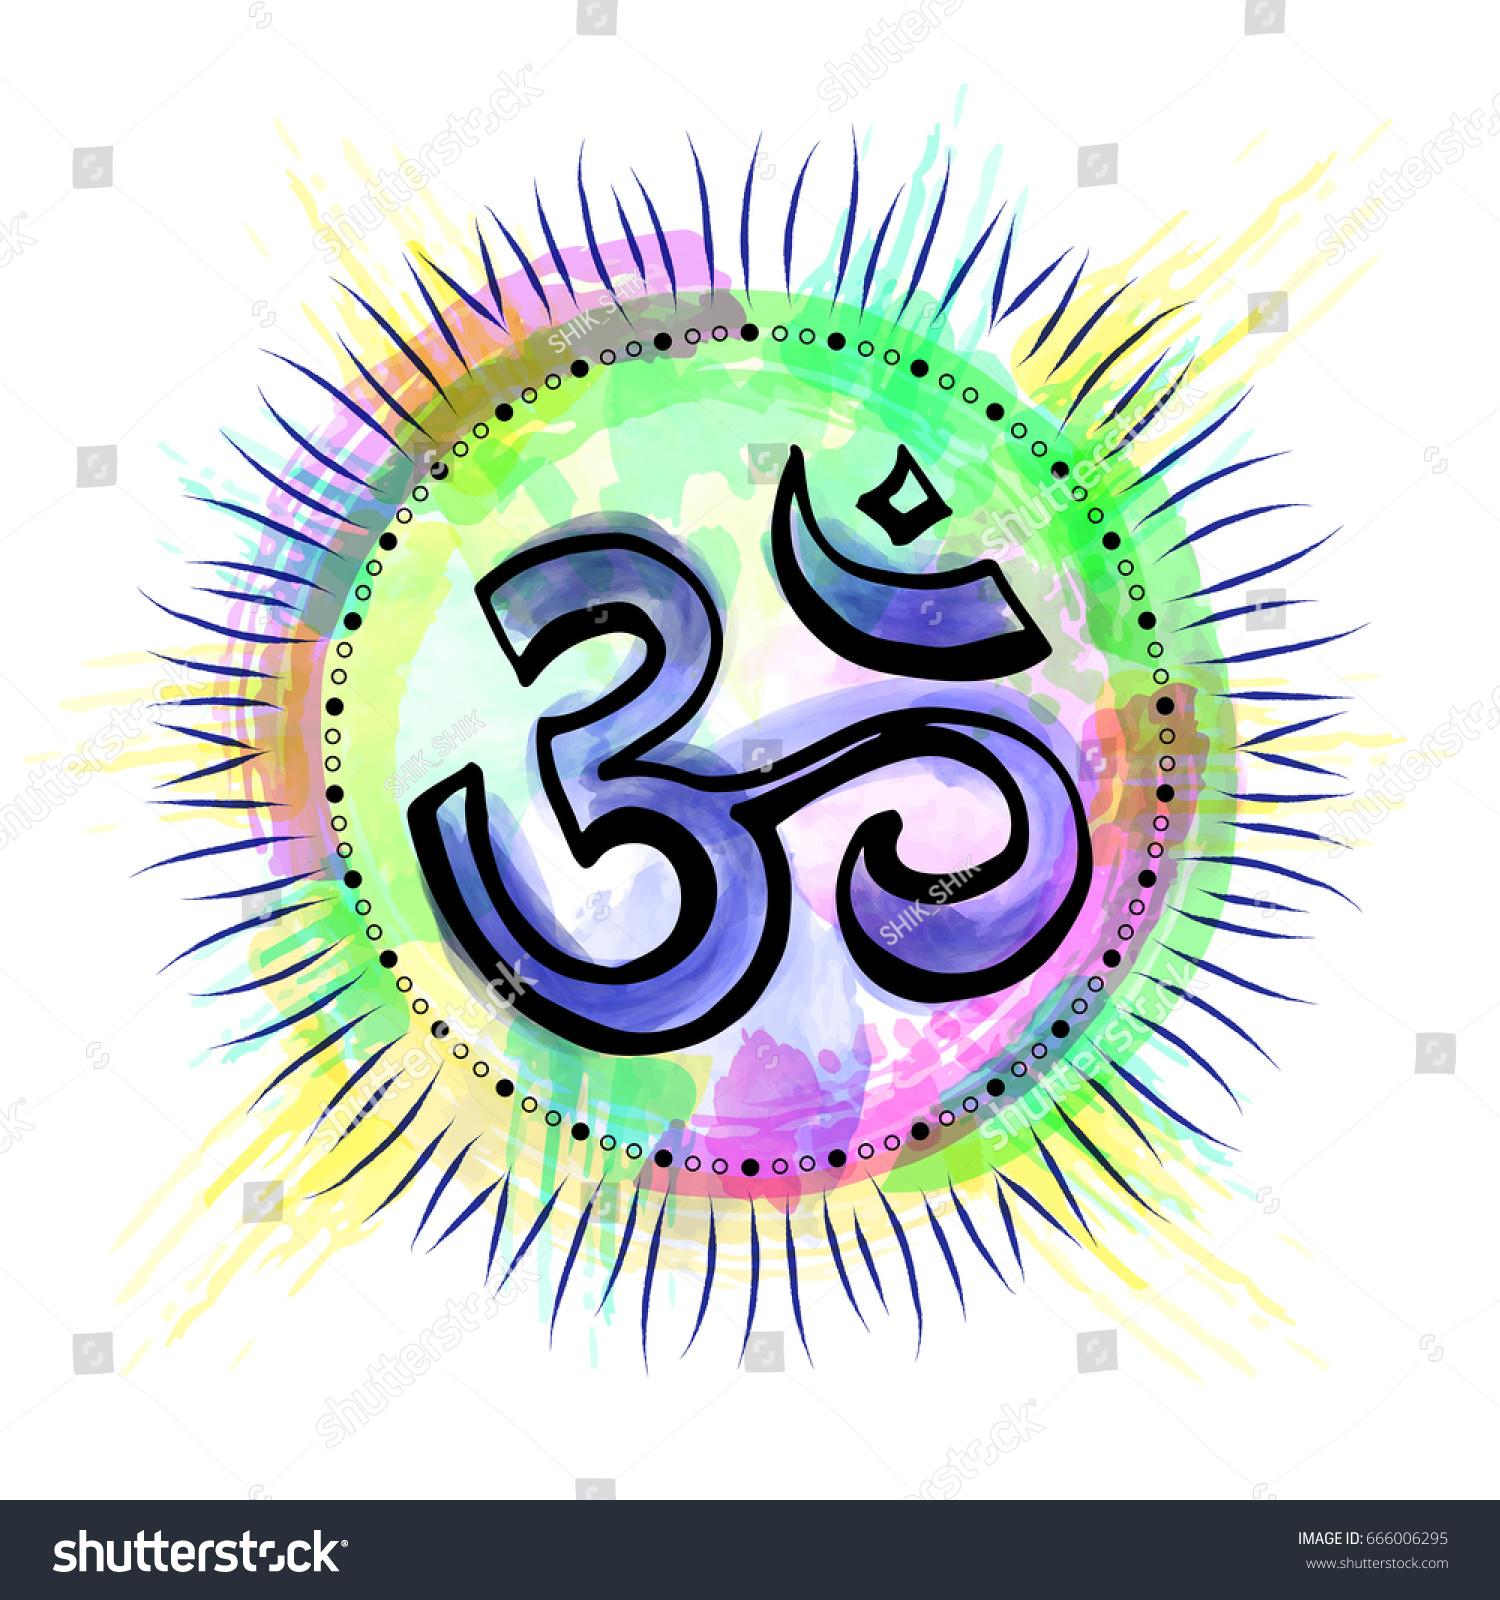 Om Aum Indian Sacred Sound Original Stock Vector 666006295